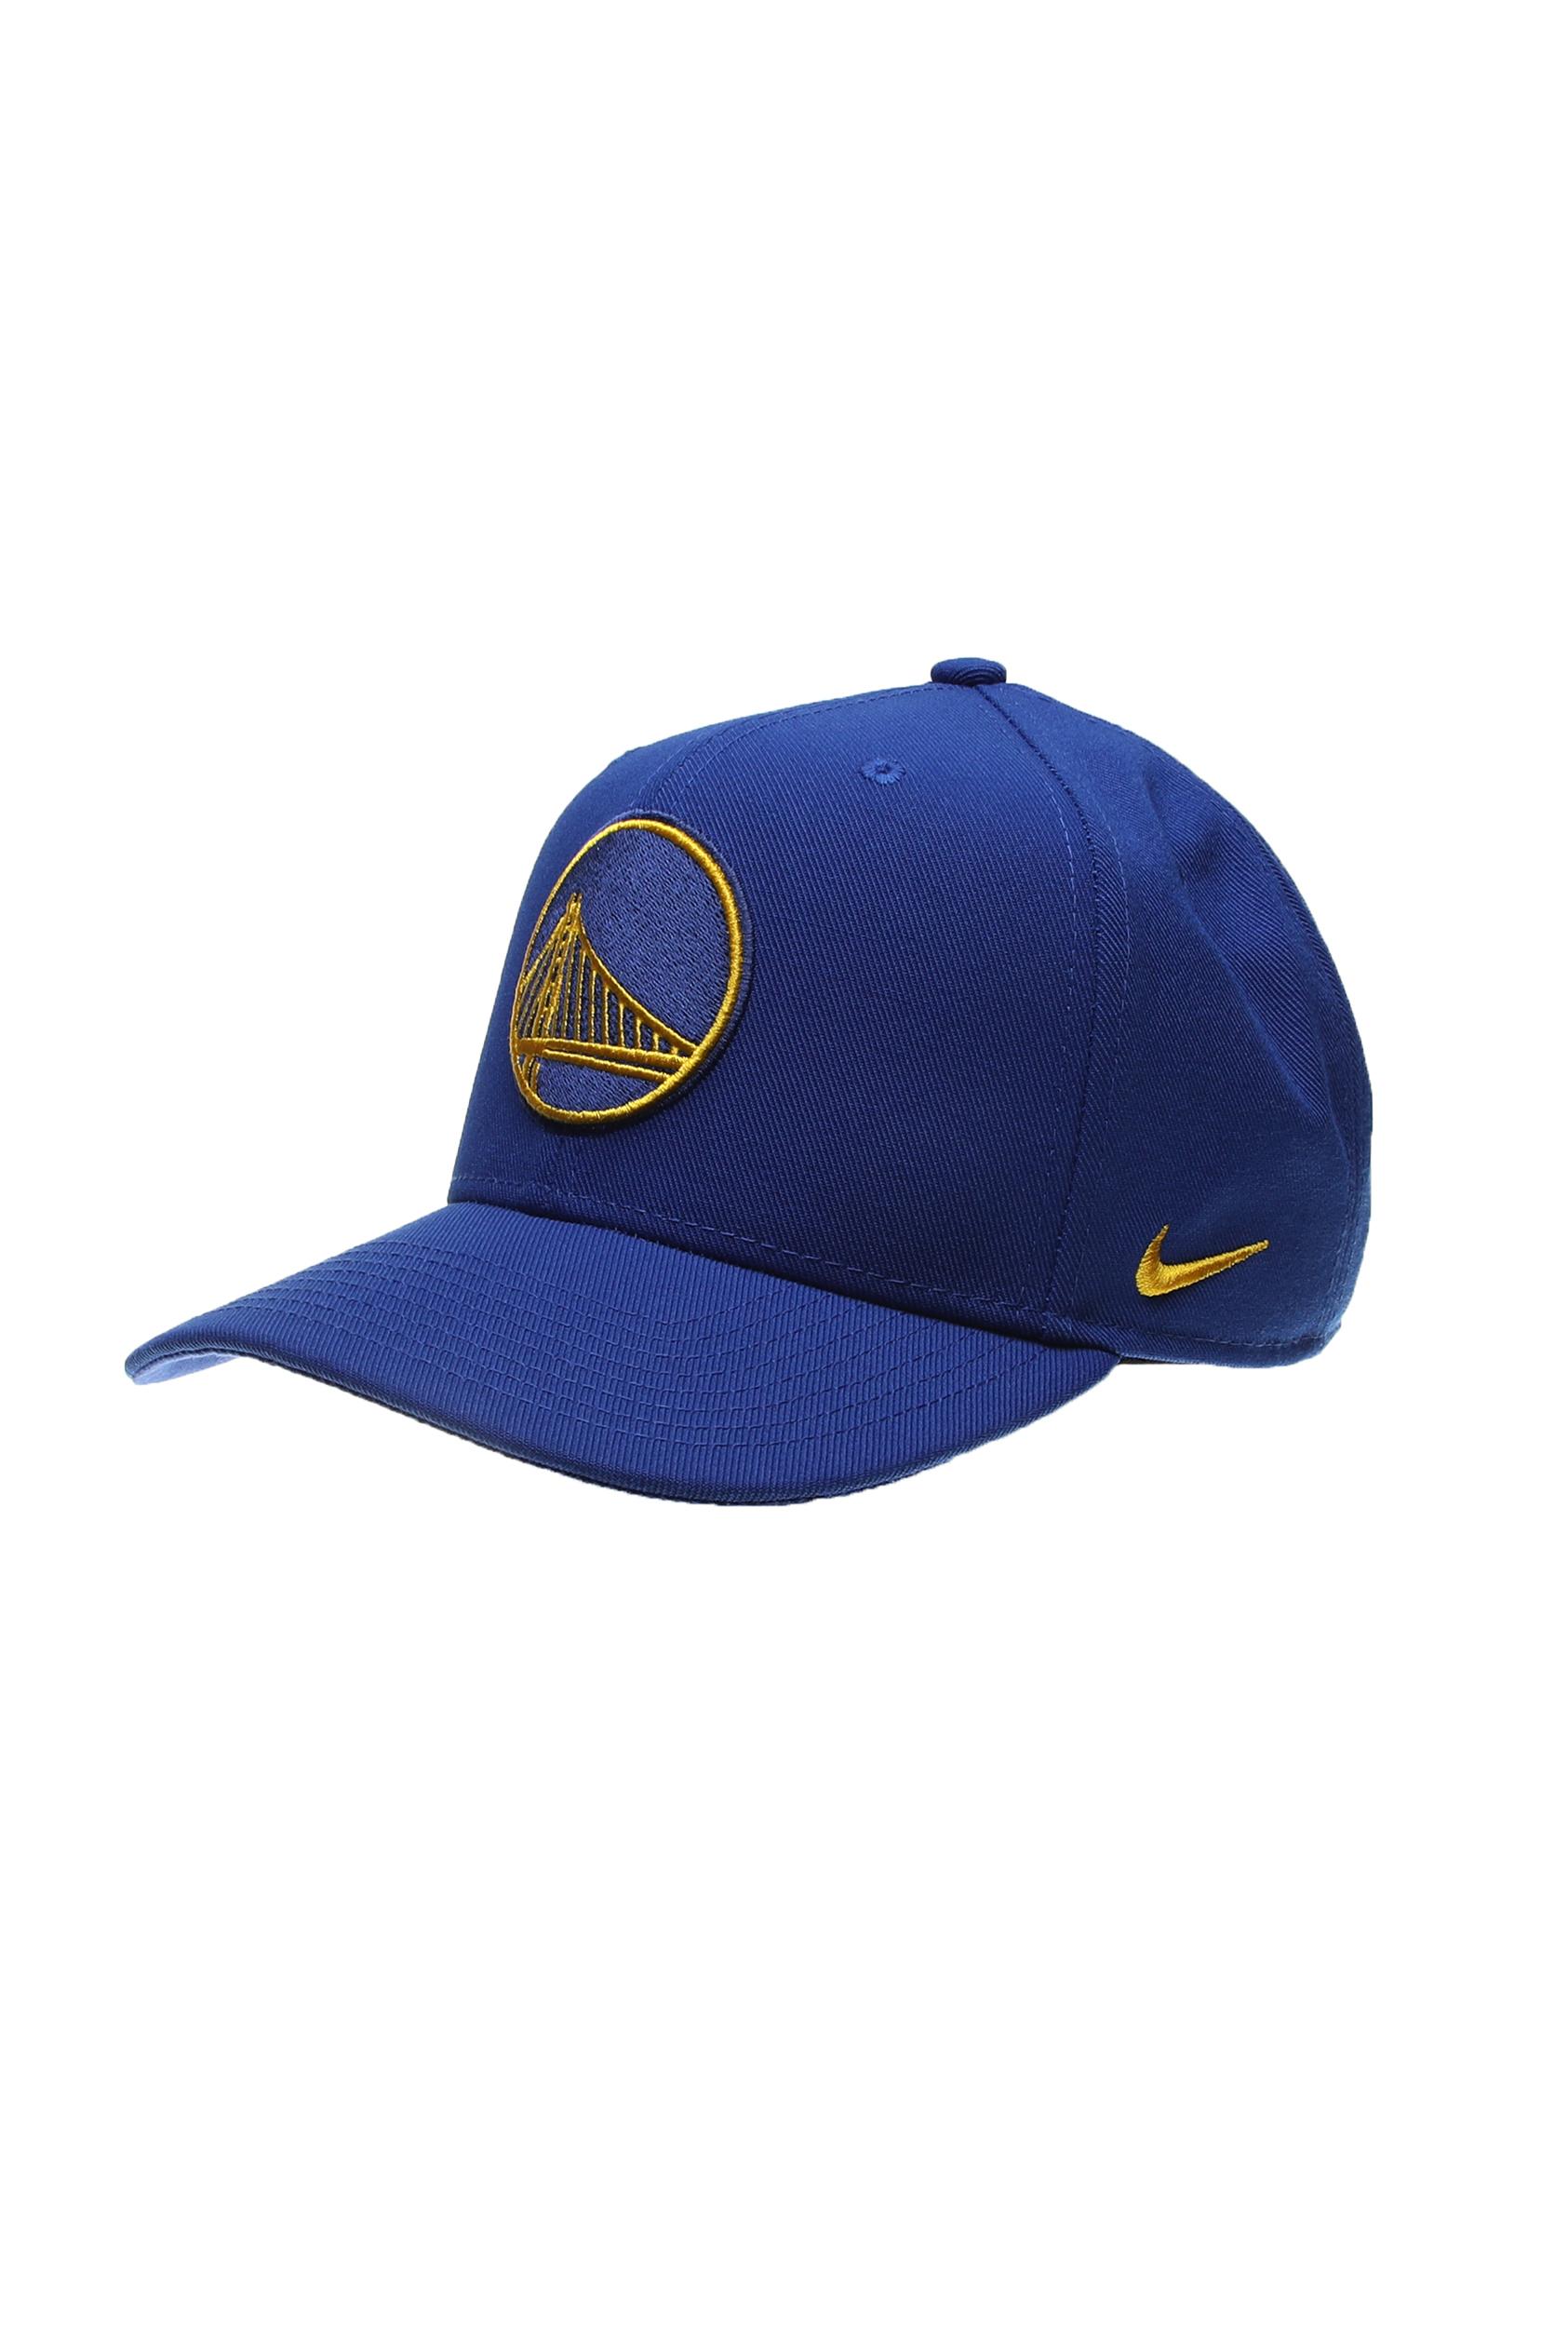 NIKE - Unisex αθλητικό καπέλο NIKE GSW NBA U NK PRO ADJ LOGO μπλε